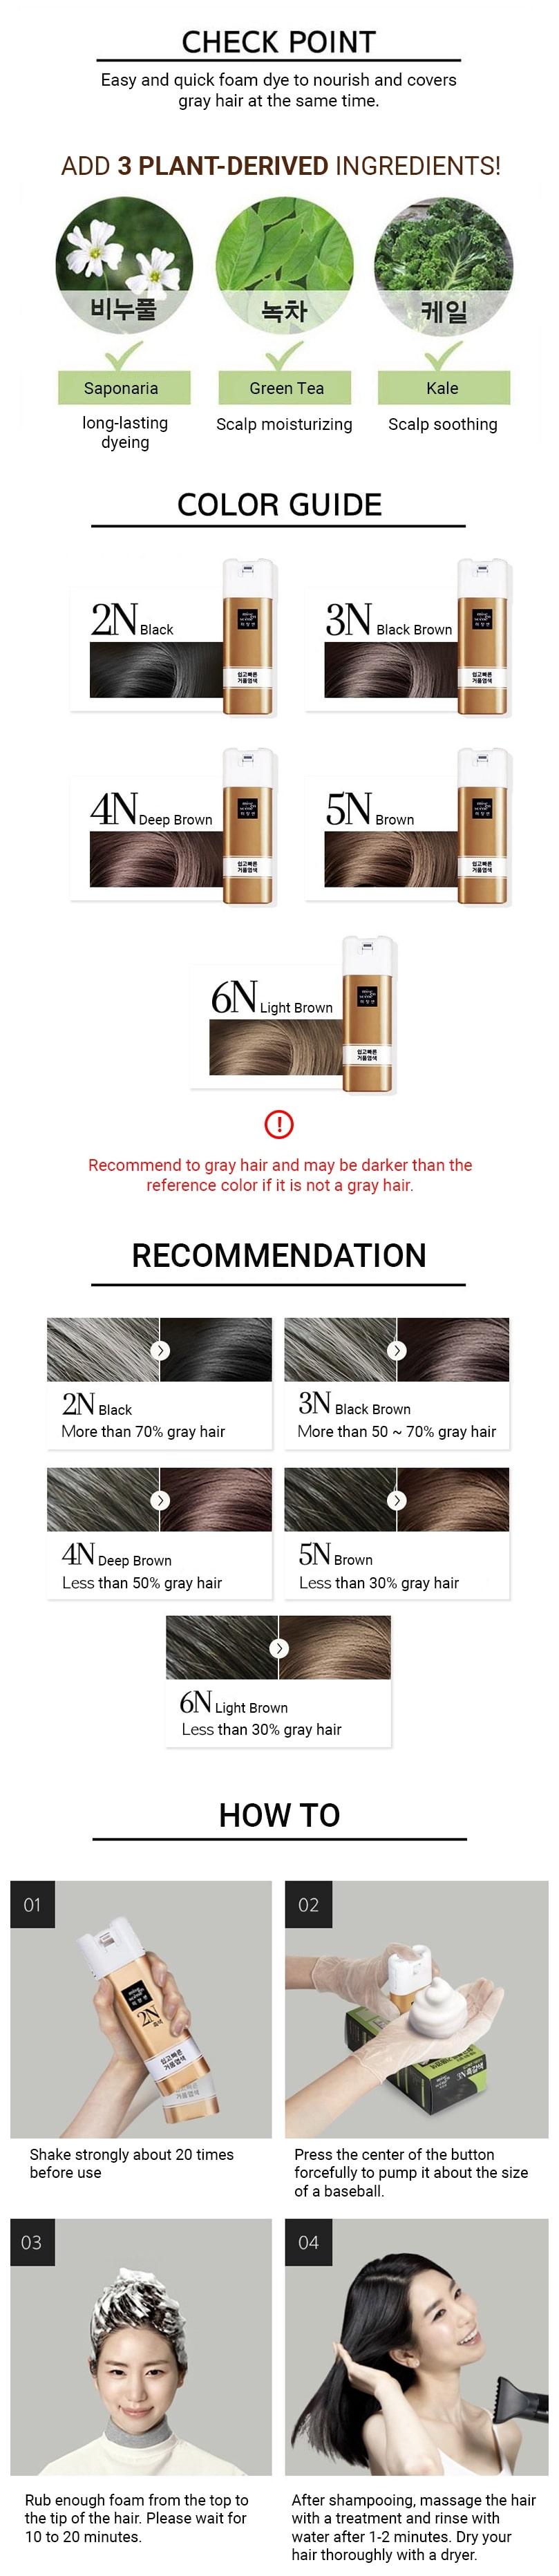 Easy Speedy Foam Hair Dye/6N (Bright Brown)